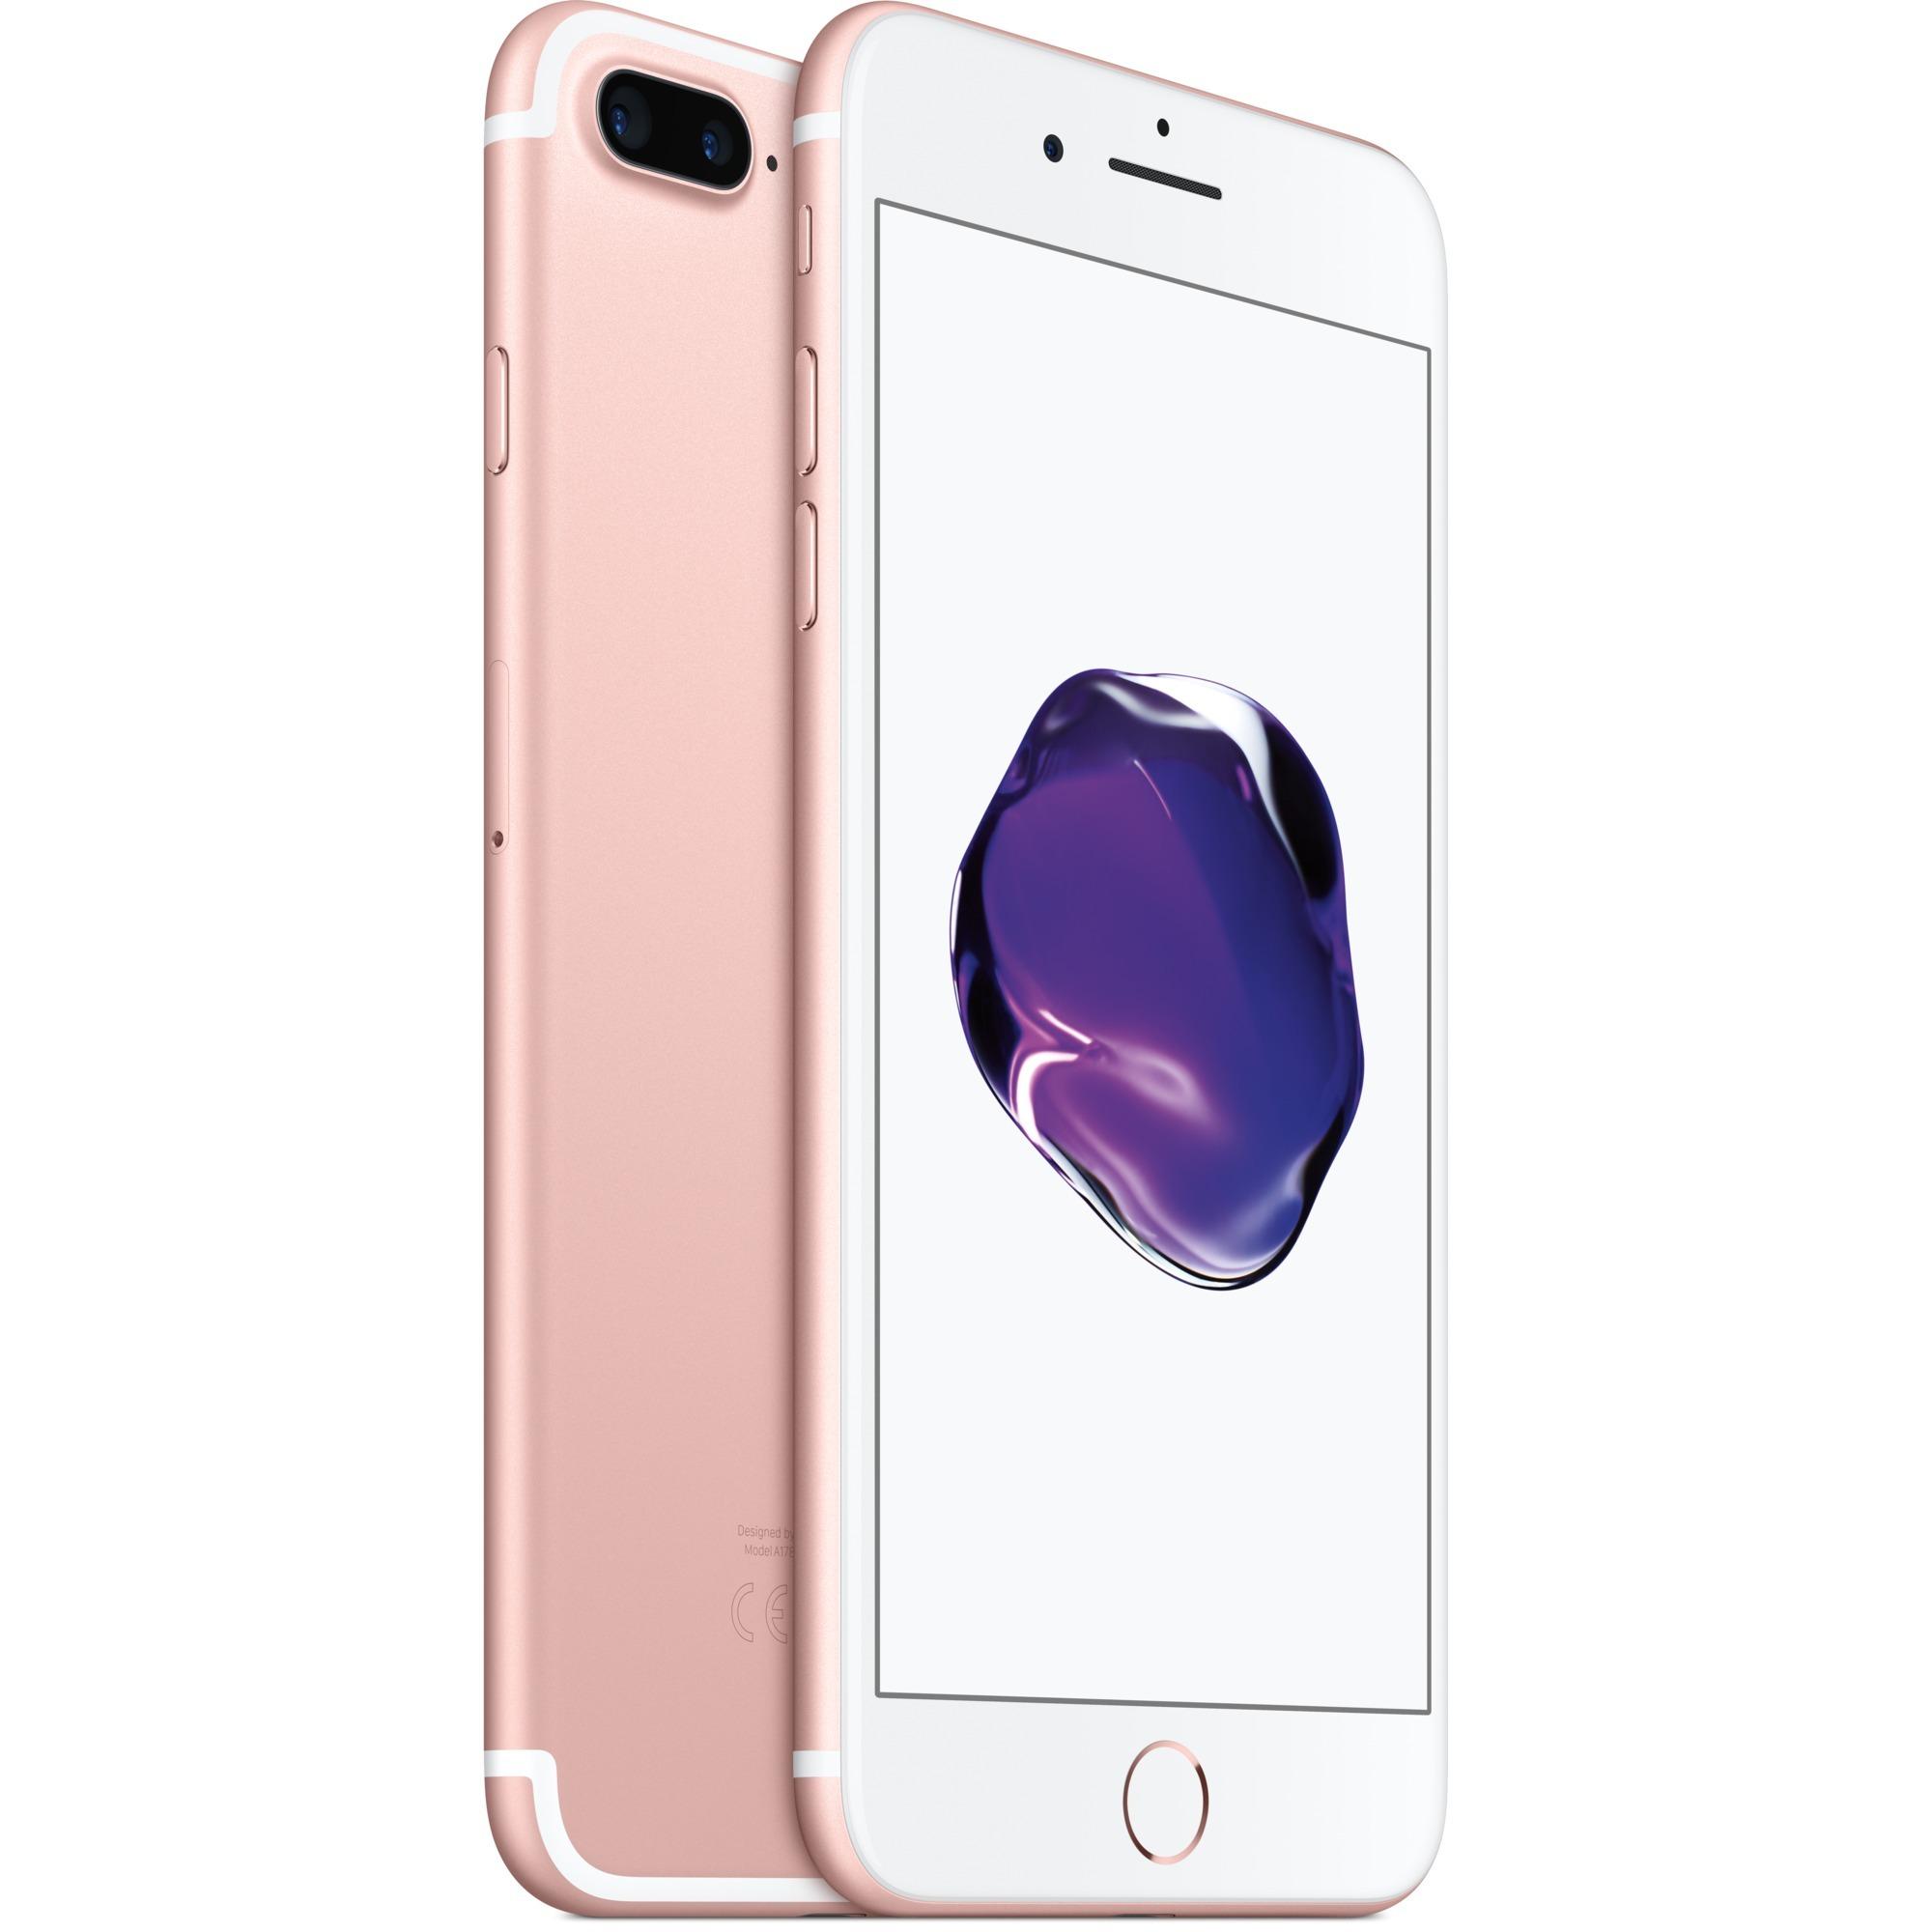 iphone-7-plus-single-sim-4g-256gb-lyserod-guld-mobiltelefon